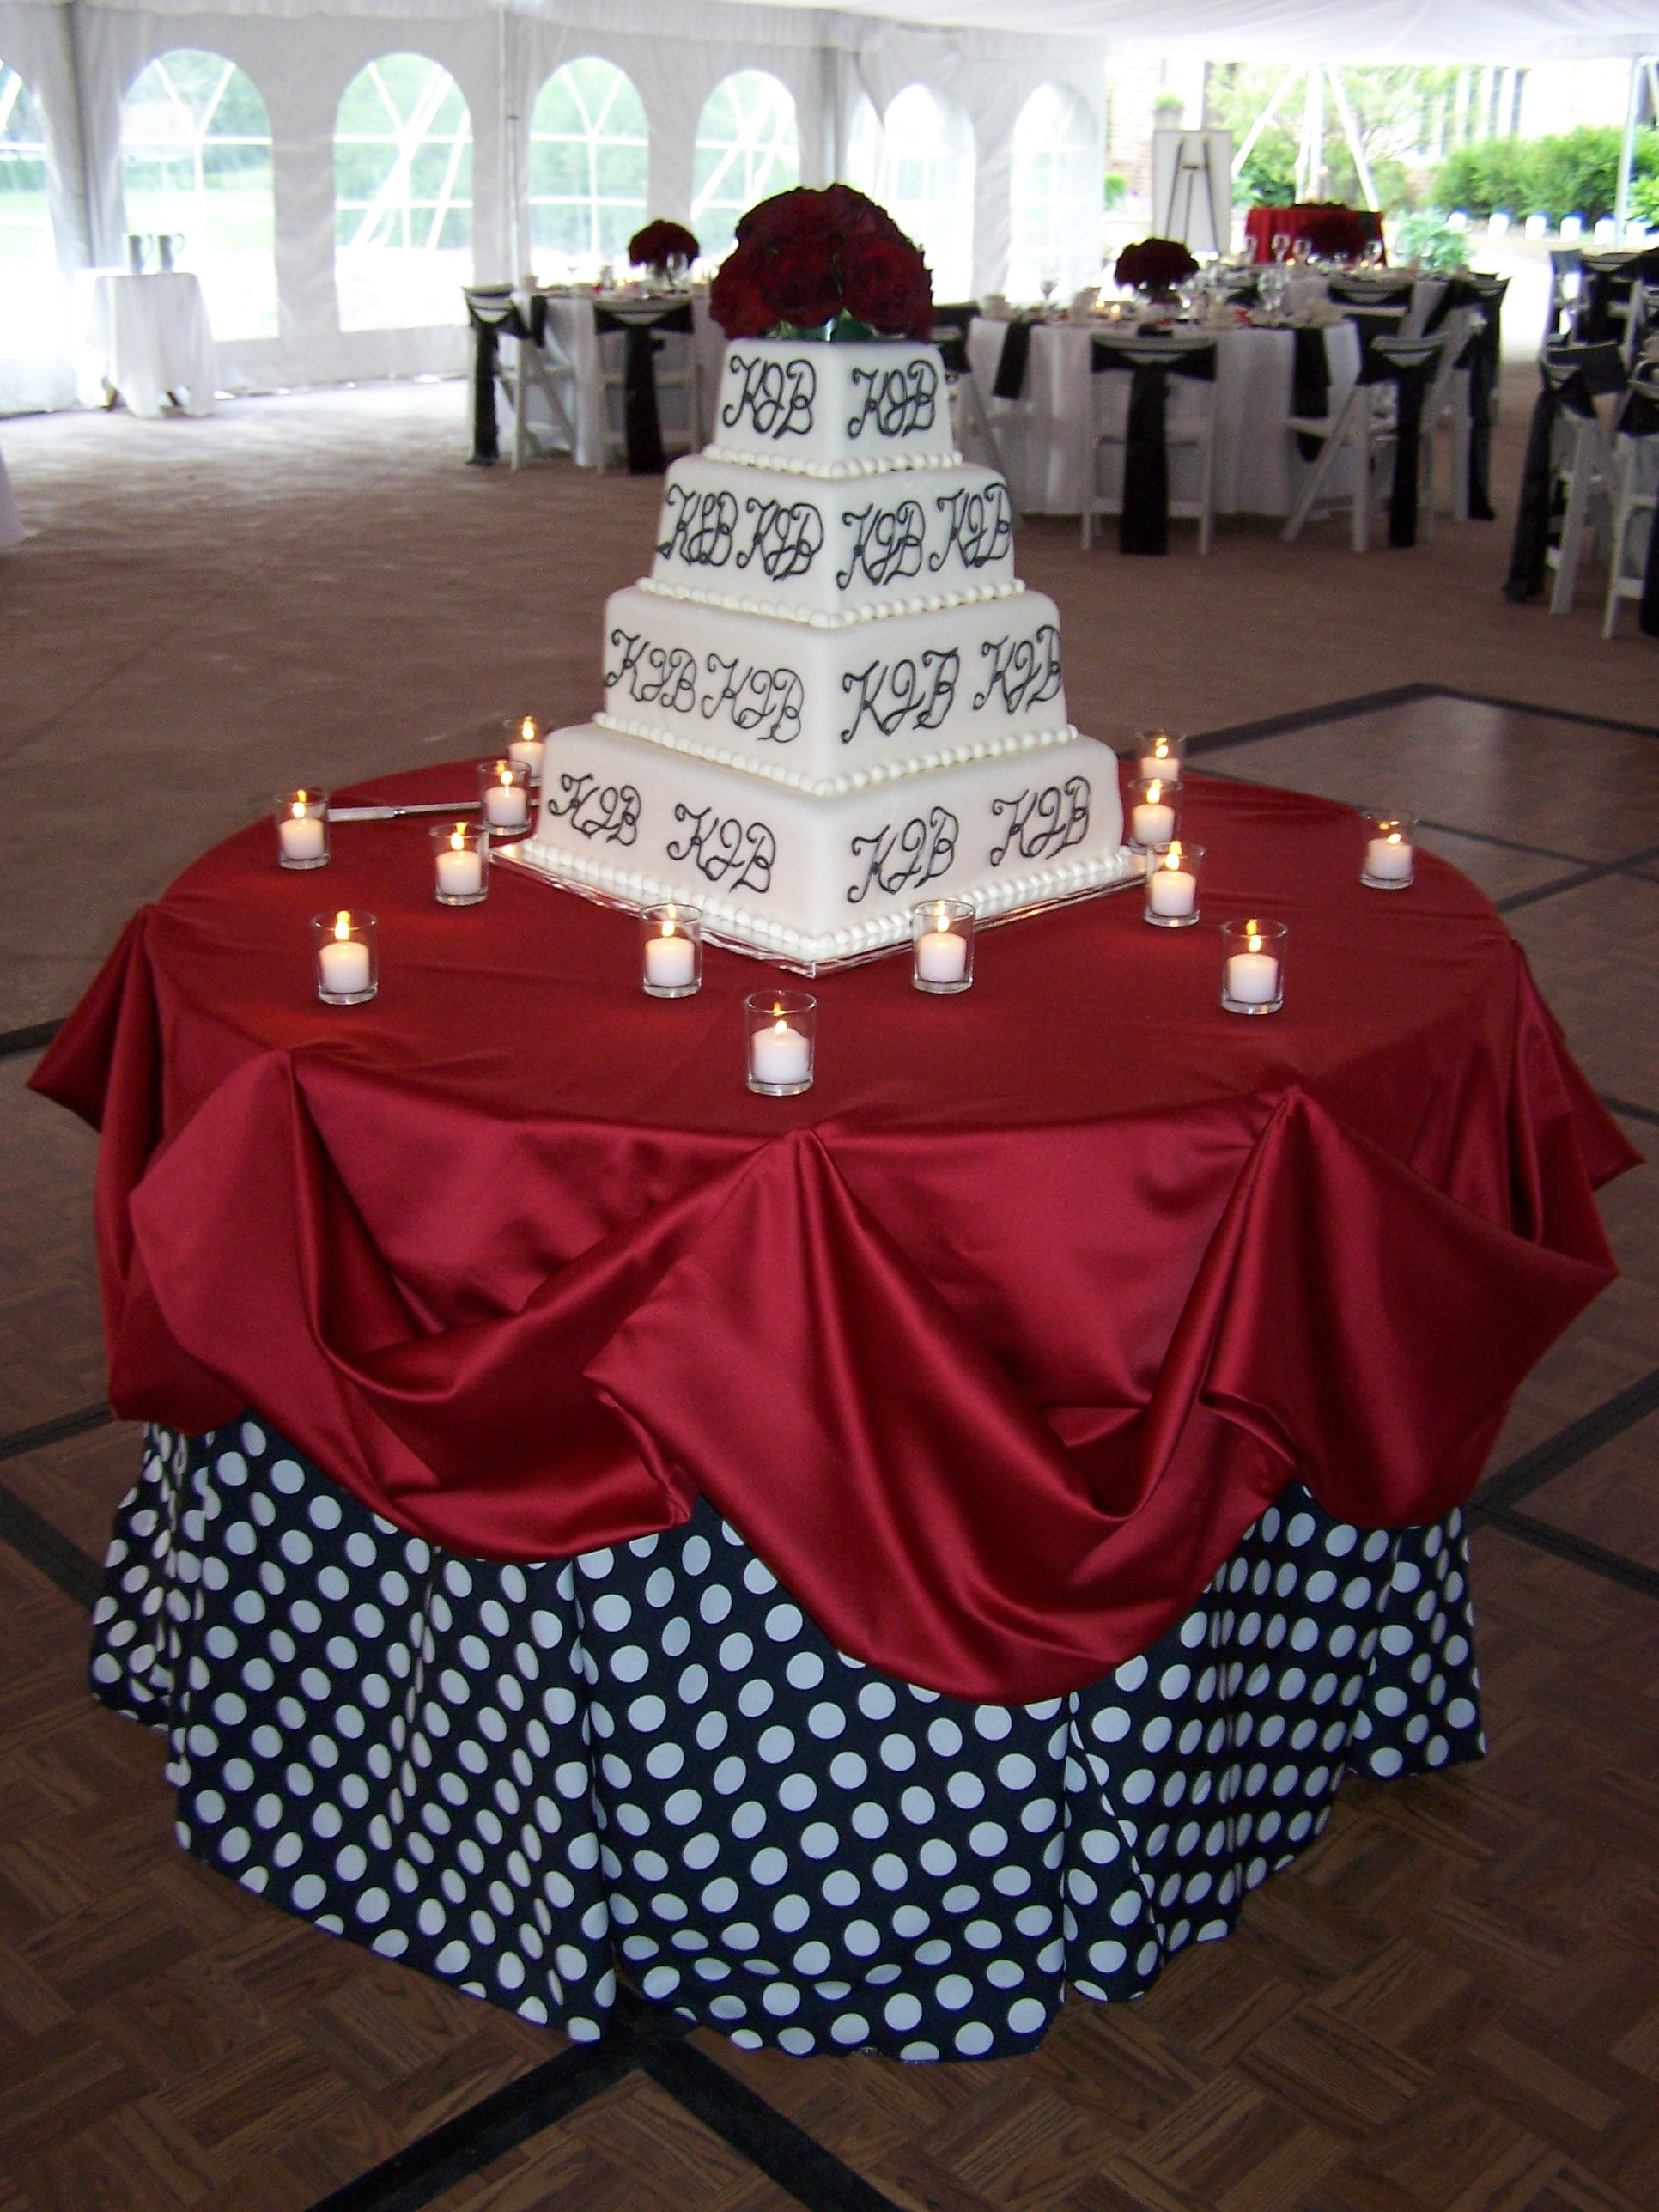 Reception, Flowers & Decor, Decor, Cakes, white, red, black, cake, Flowers, Polka dot